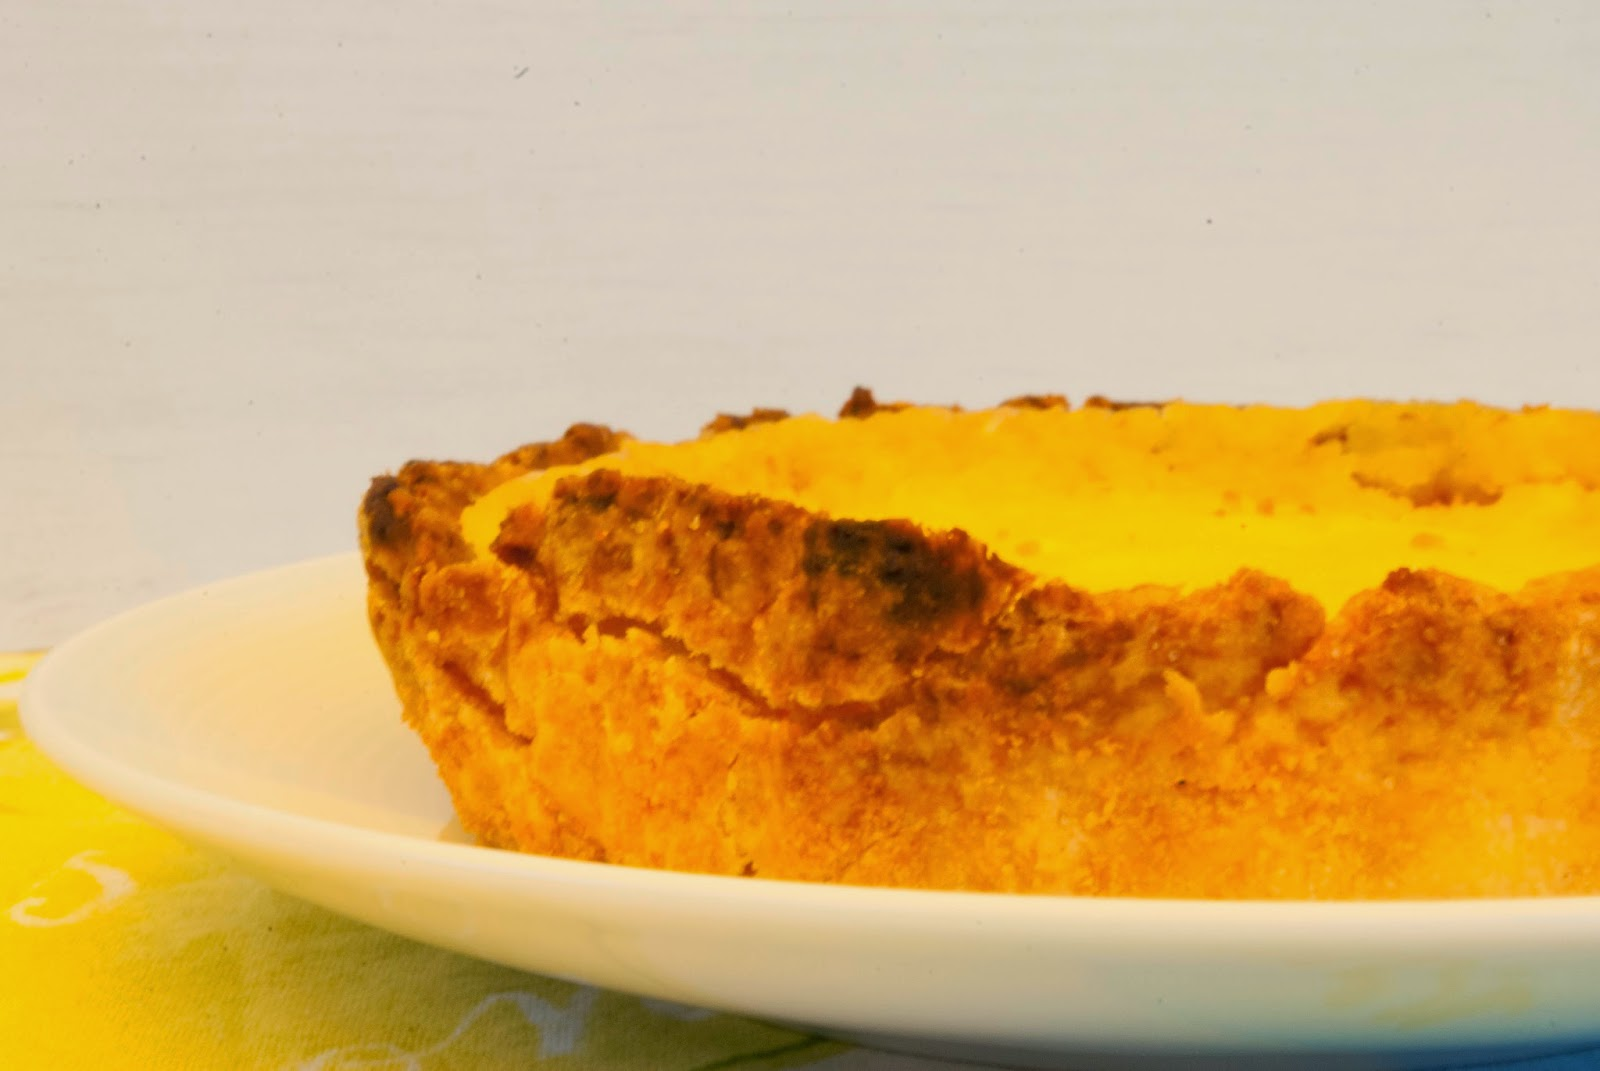 Lemon Curd Tarte Backen Kuchen Tarte Rezept Torte Lecker backfreak Küche Kochen zitrone Citrus Zitrus Sommer Geburtstag Geschenk Gelb Hupsis Serendipity